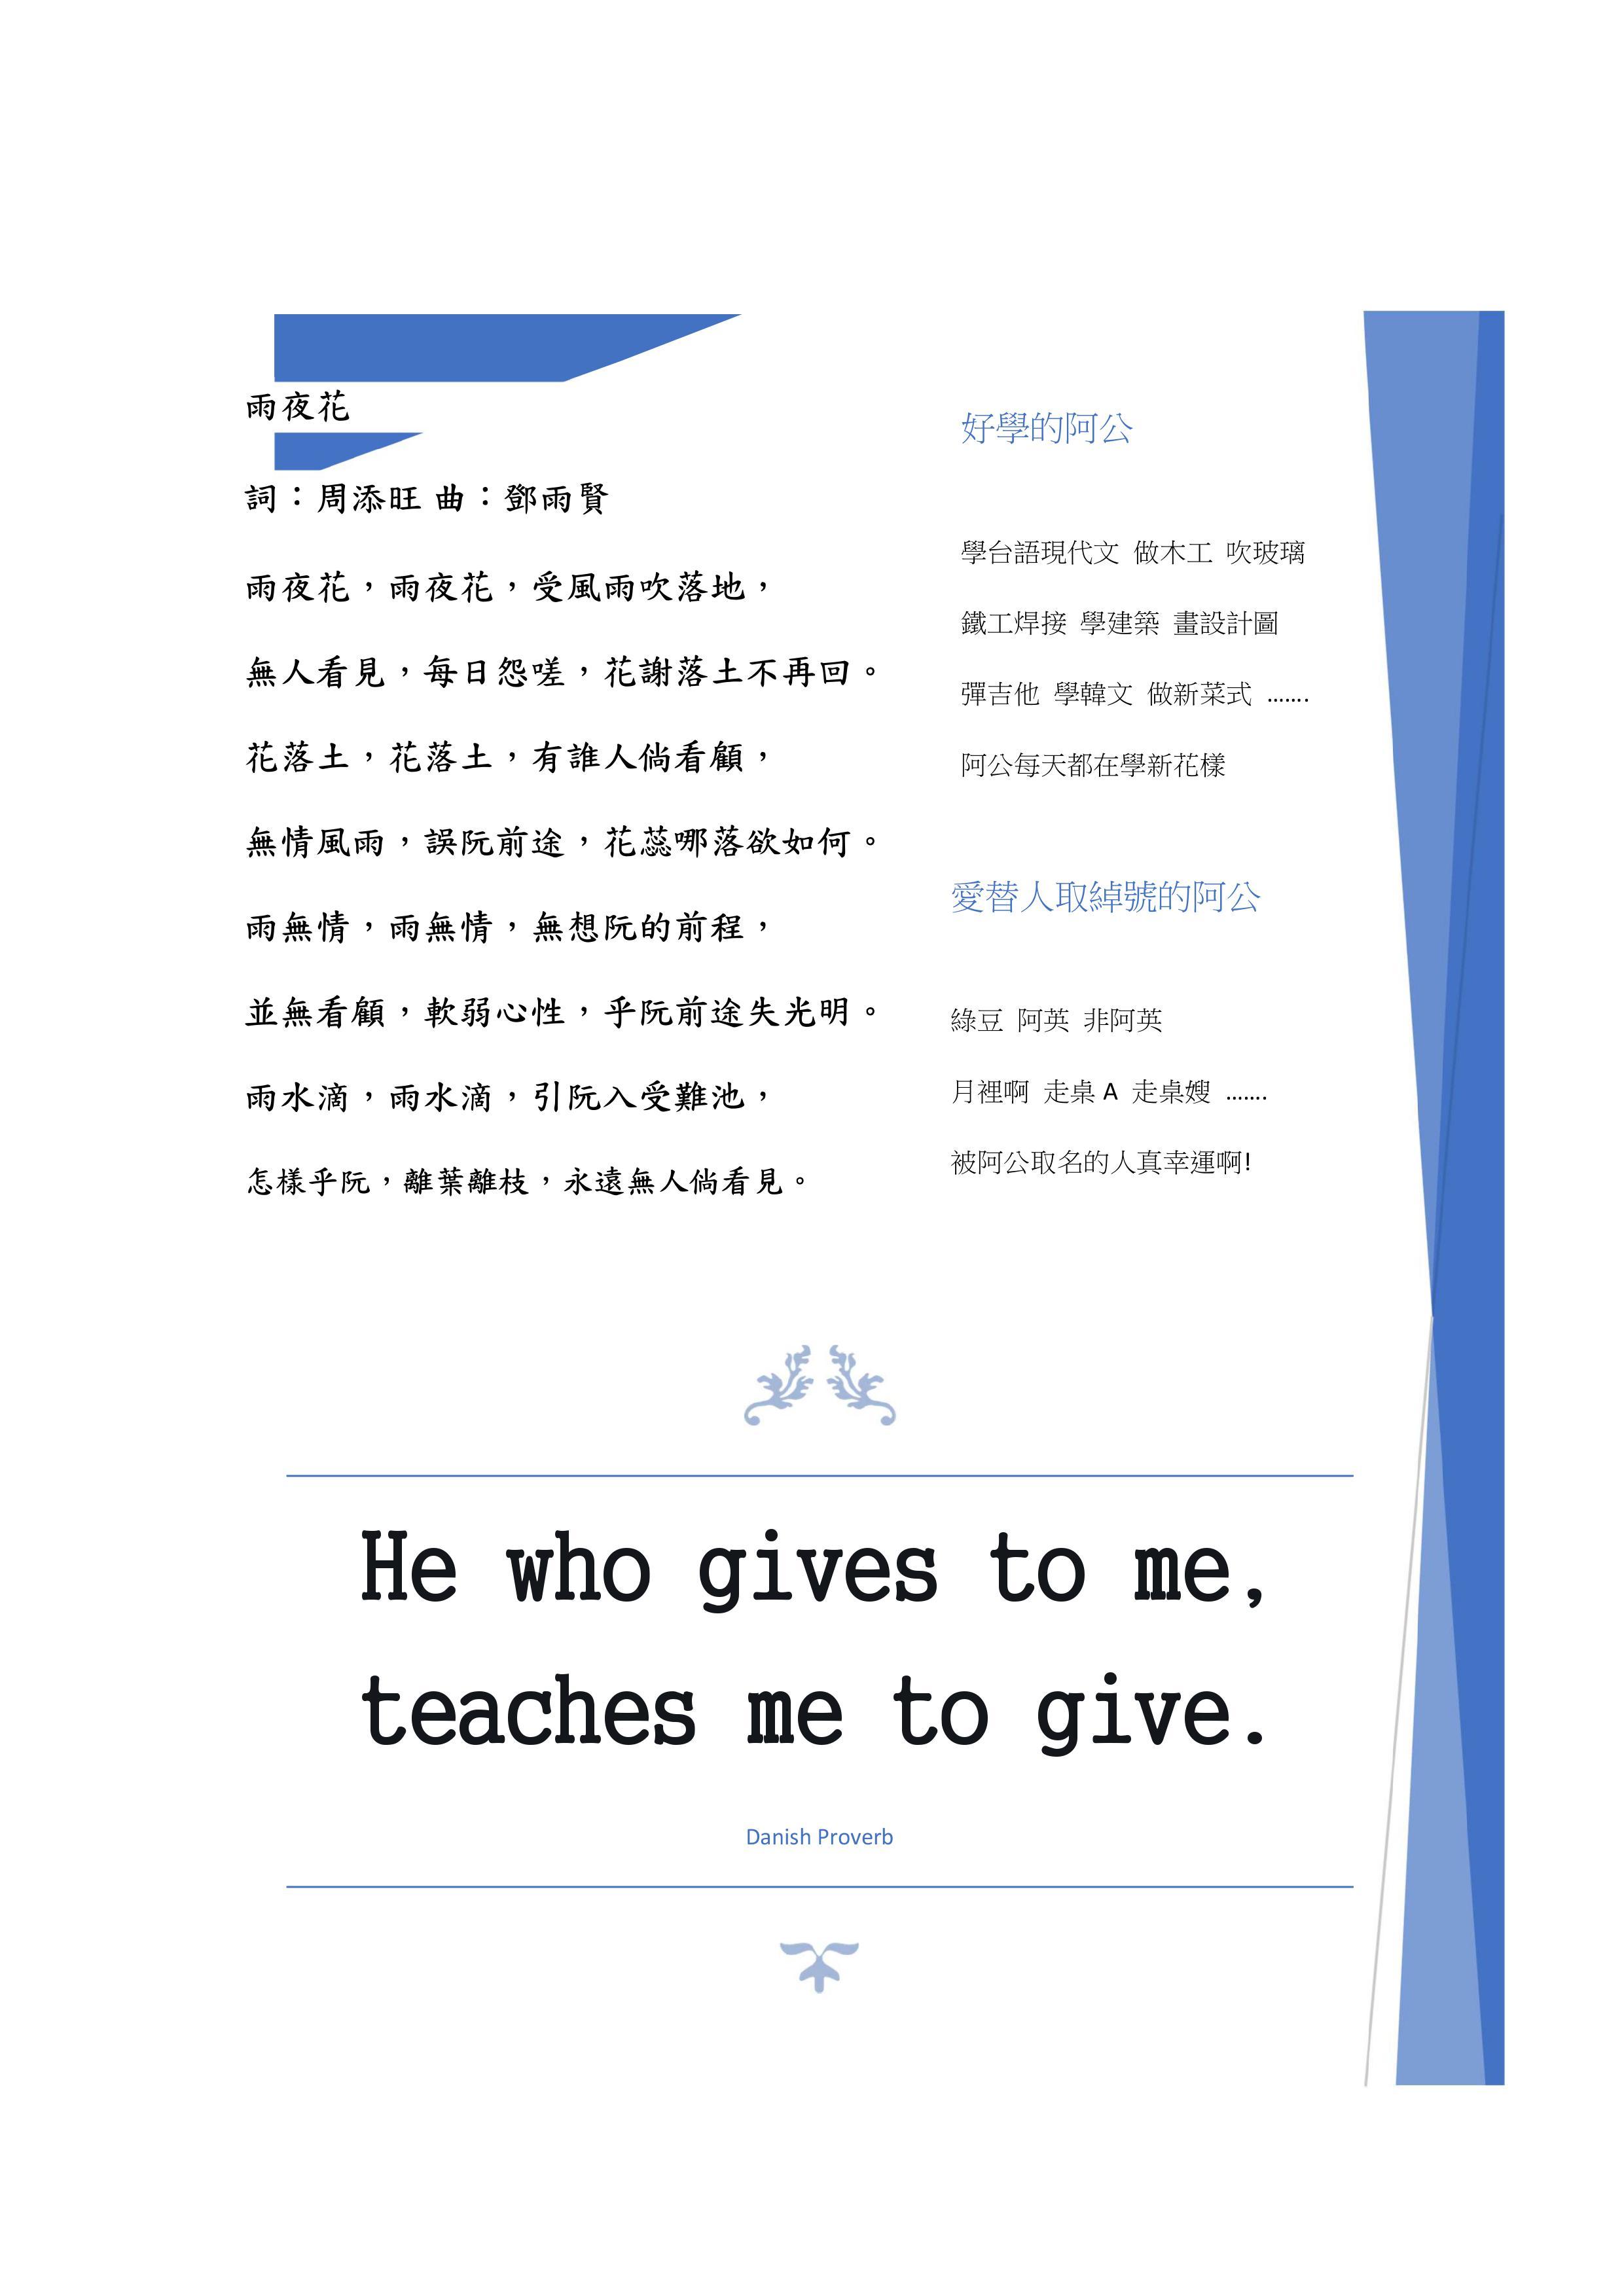 In Memory of Dr. Yung-San Liang 梁永三 博士生命的禮讚